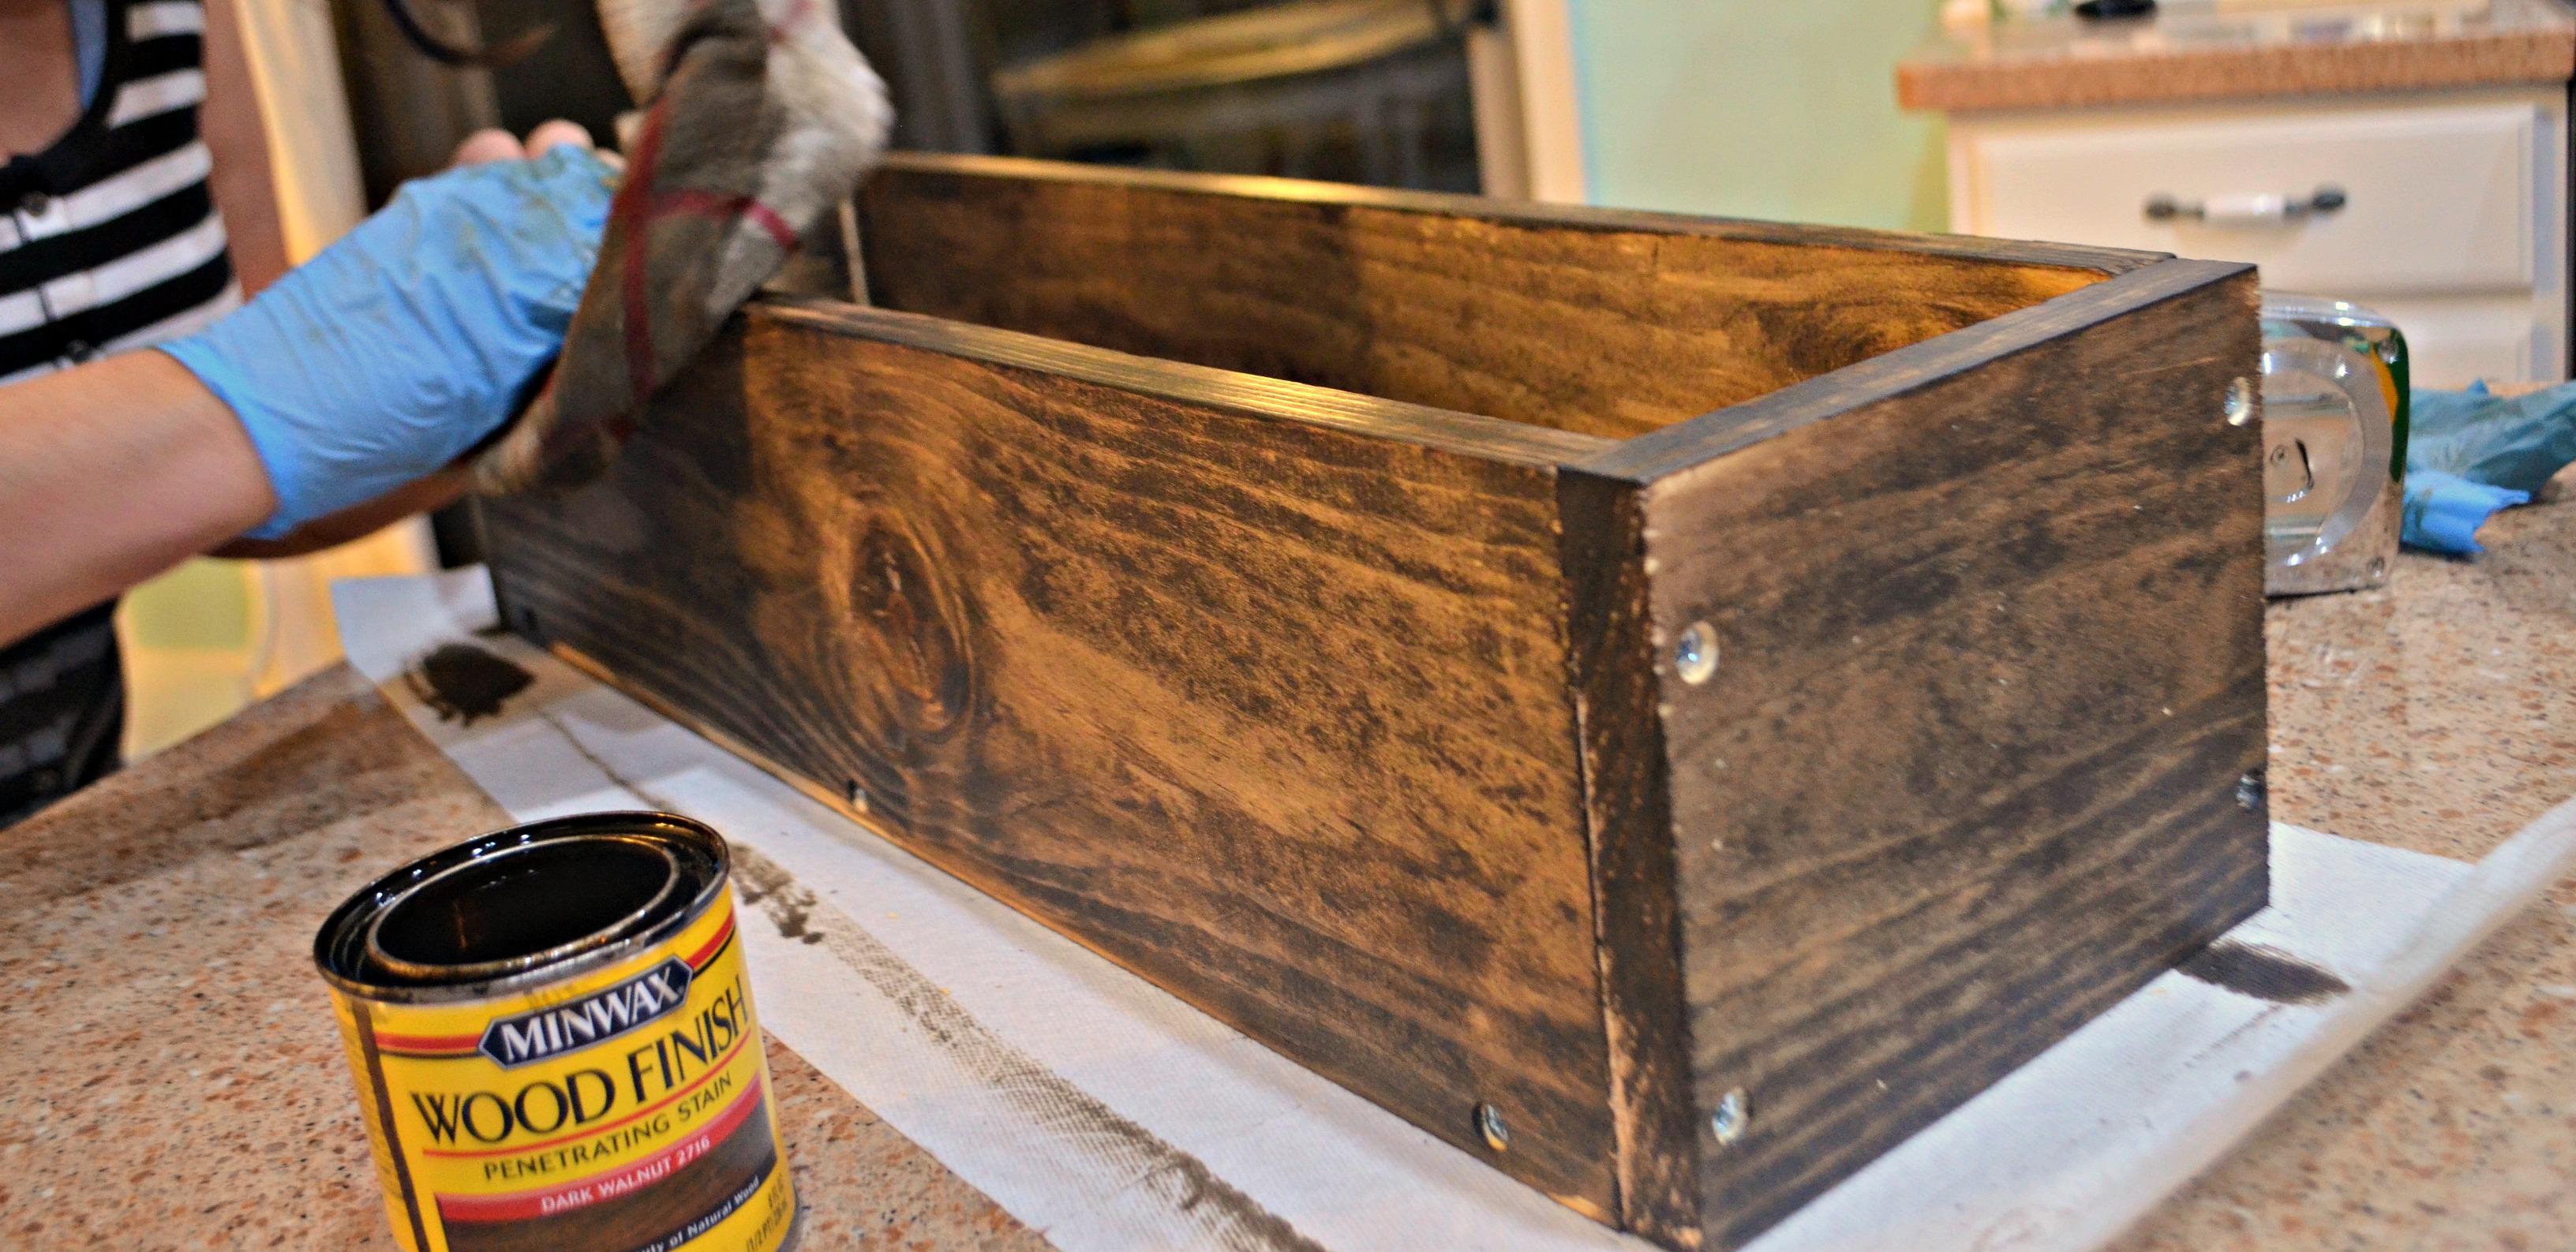 diy rustic farmhouse wood box centerpiece – staining the box